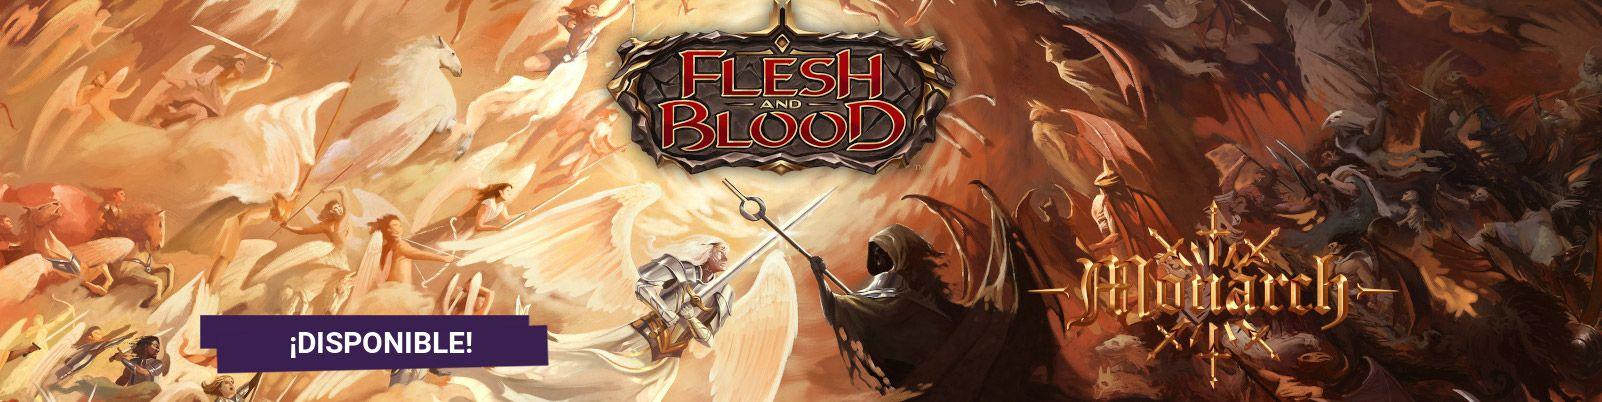 Comprar Flesh and Blood Monarch